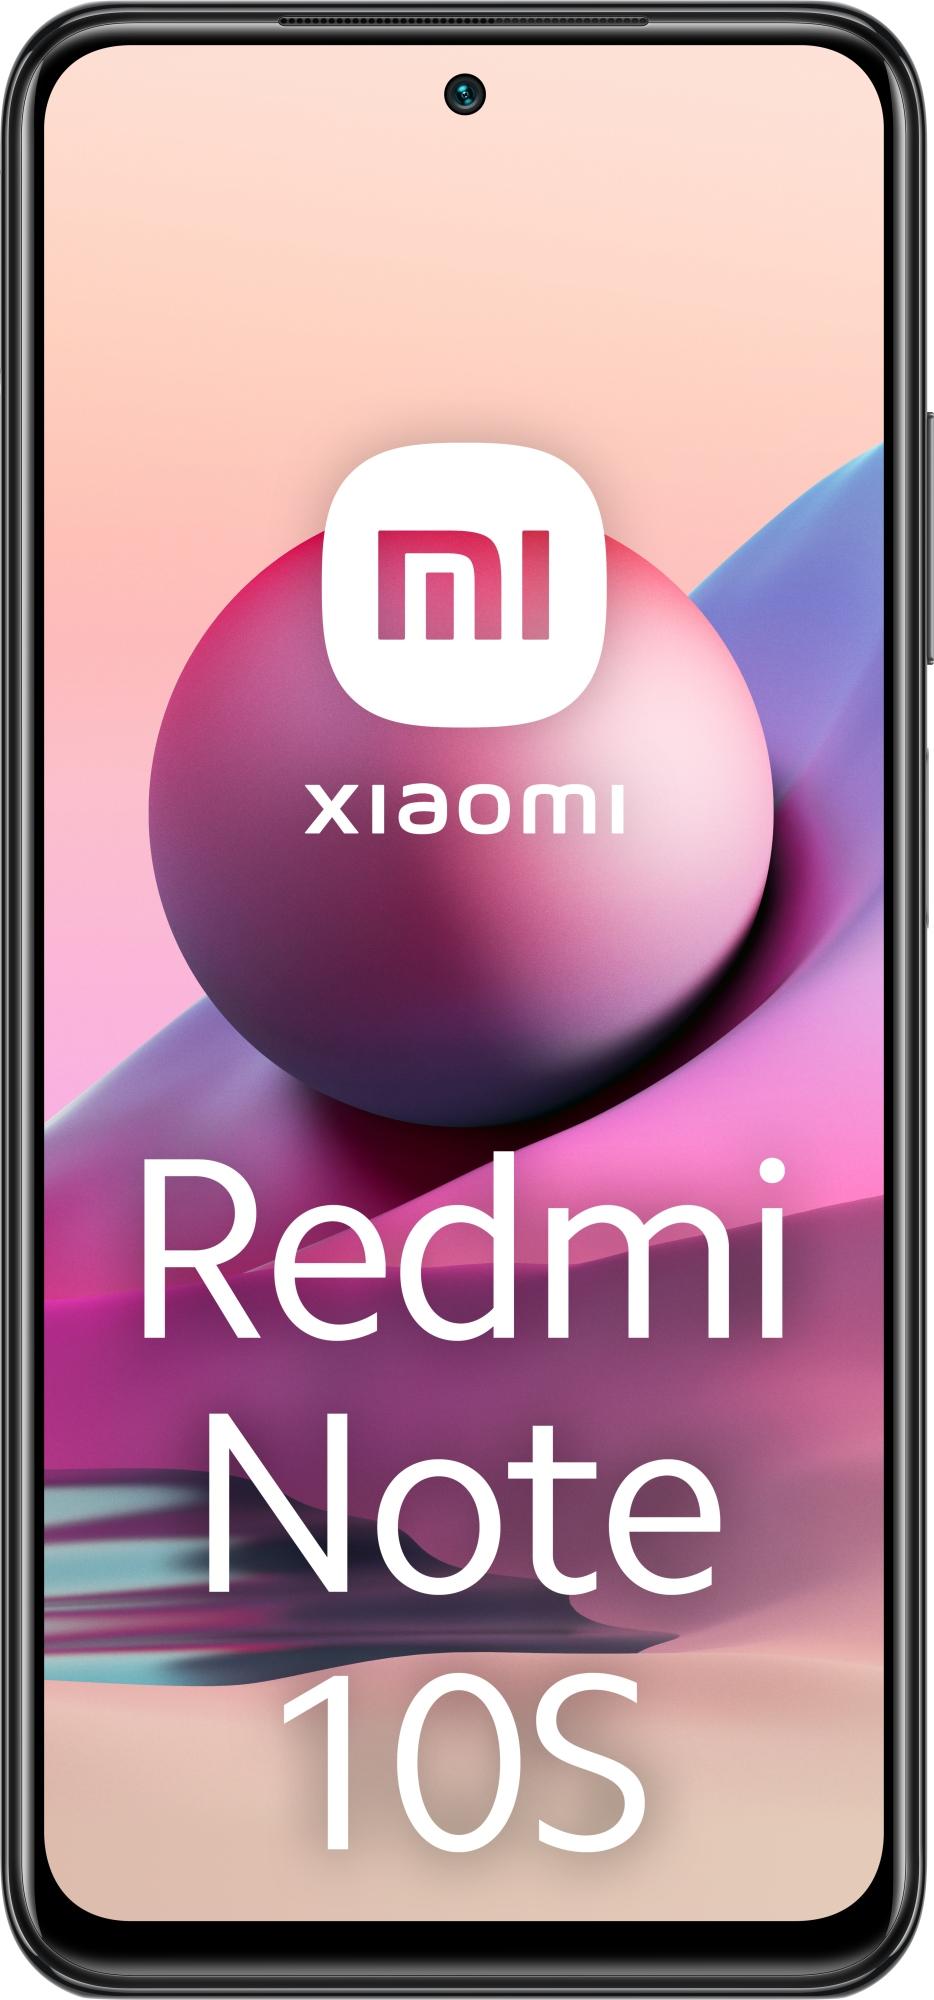 "REDMI NOTE 10S 16,3 CM (6.43"") SIM DOBLE MIUI 12.5 4G USB TIPO C 6 GB 128 GB 5000 MAH GRIS"